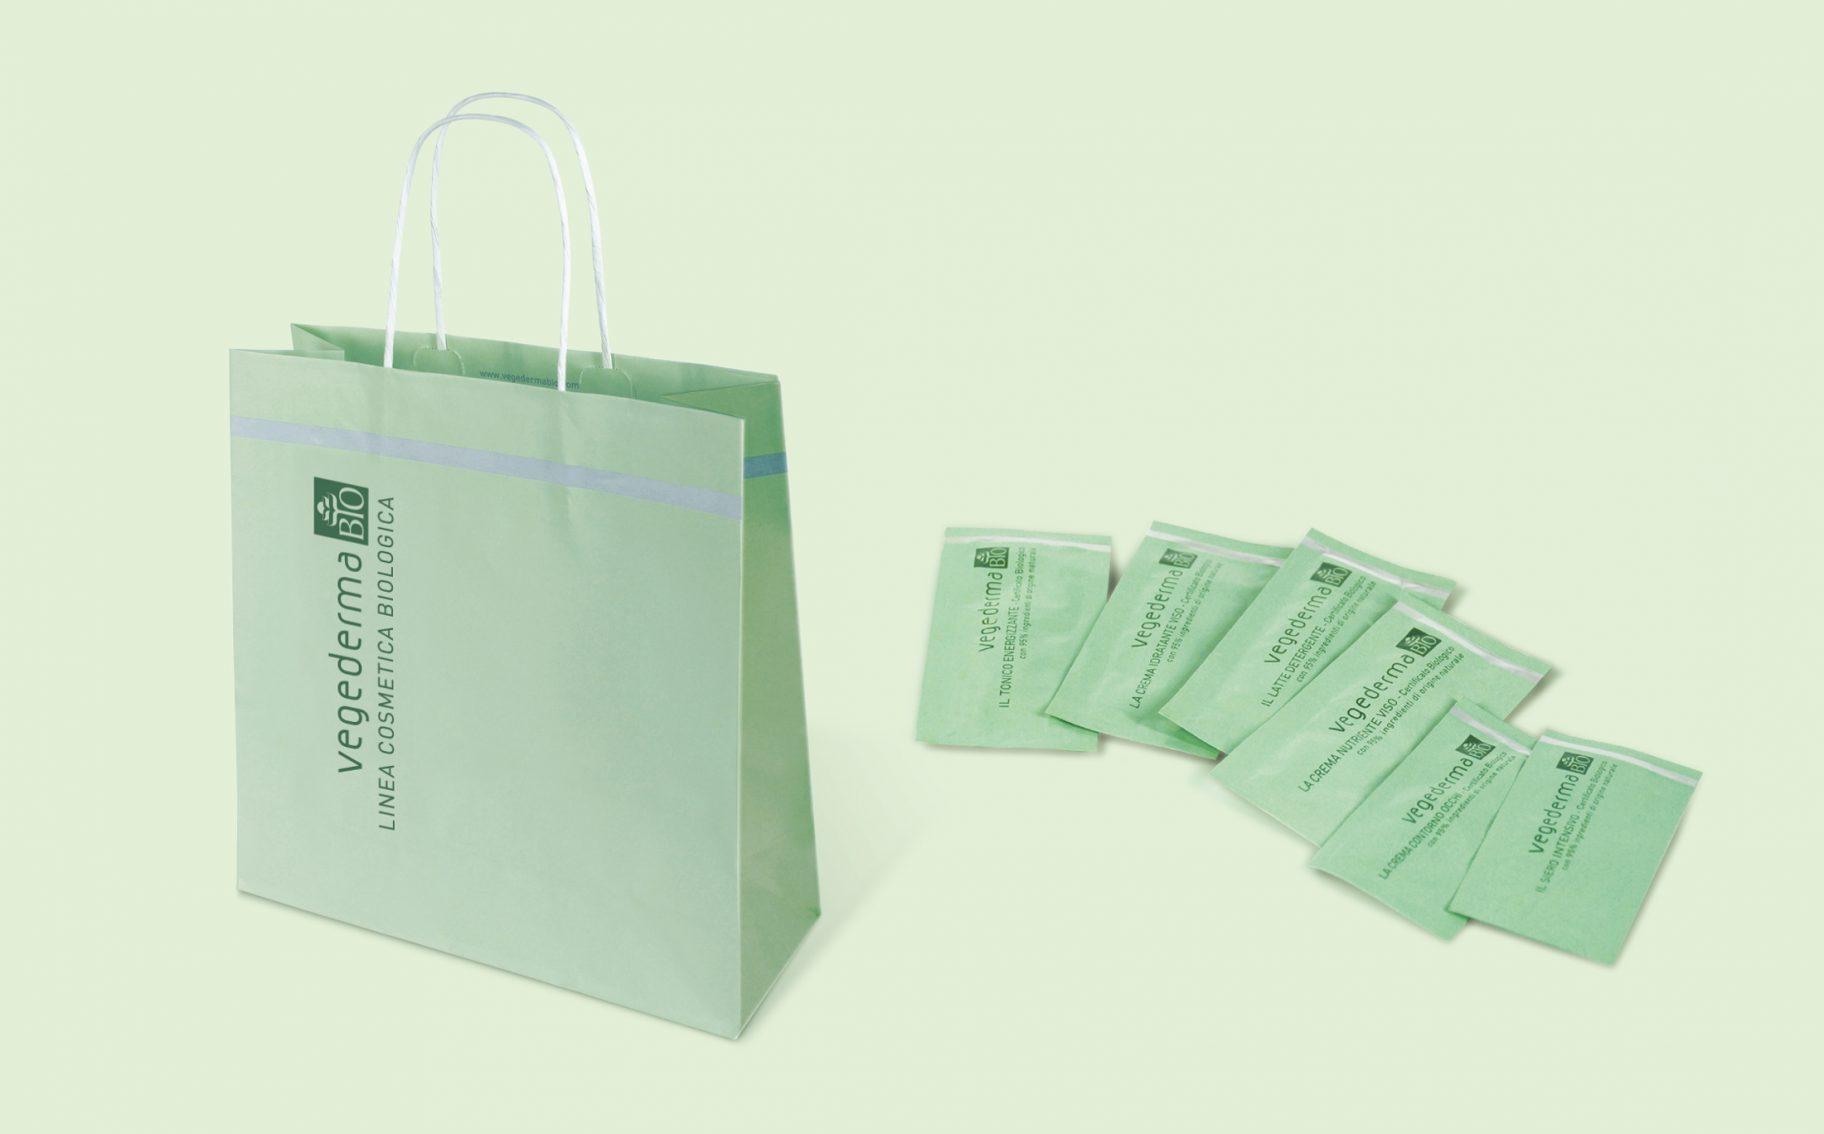 BEAUTIMPORT VegedermaBIO-shopper bag-bustine